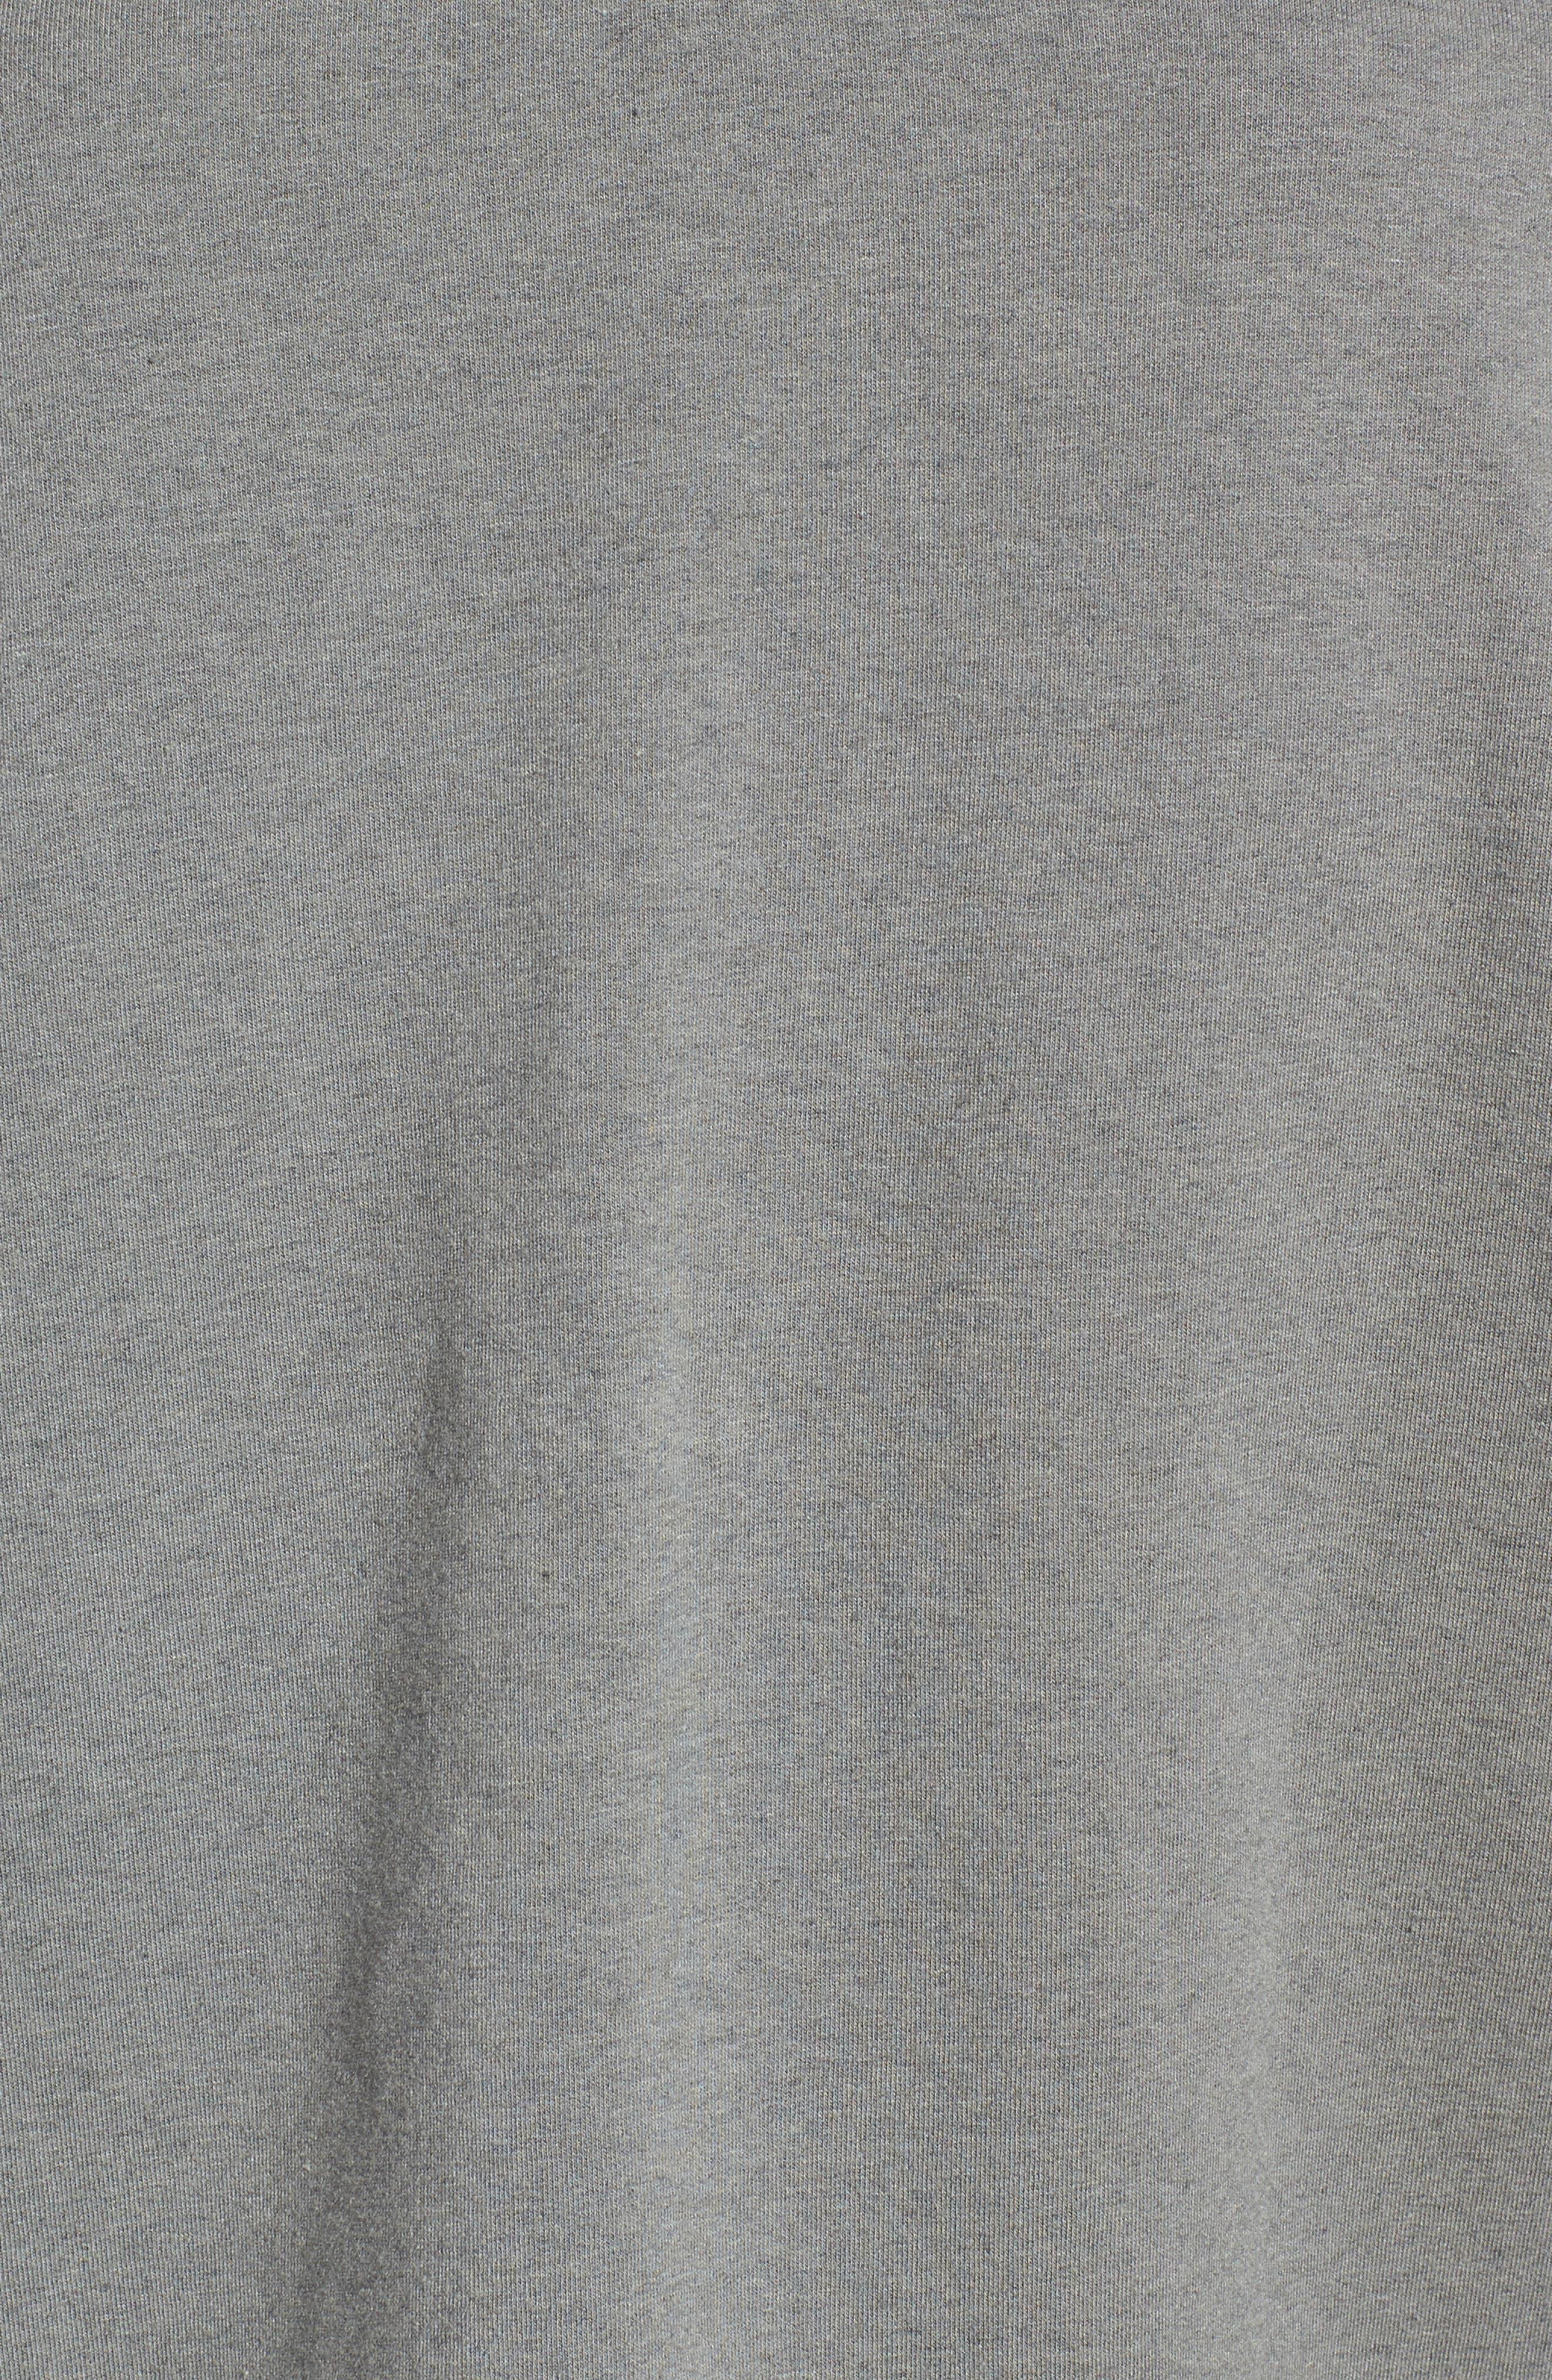 Aerosmith Sweatshirt,                             Alternate thumbnail 6, color,                             378